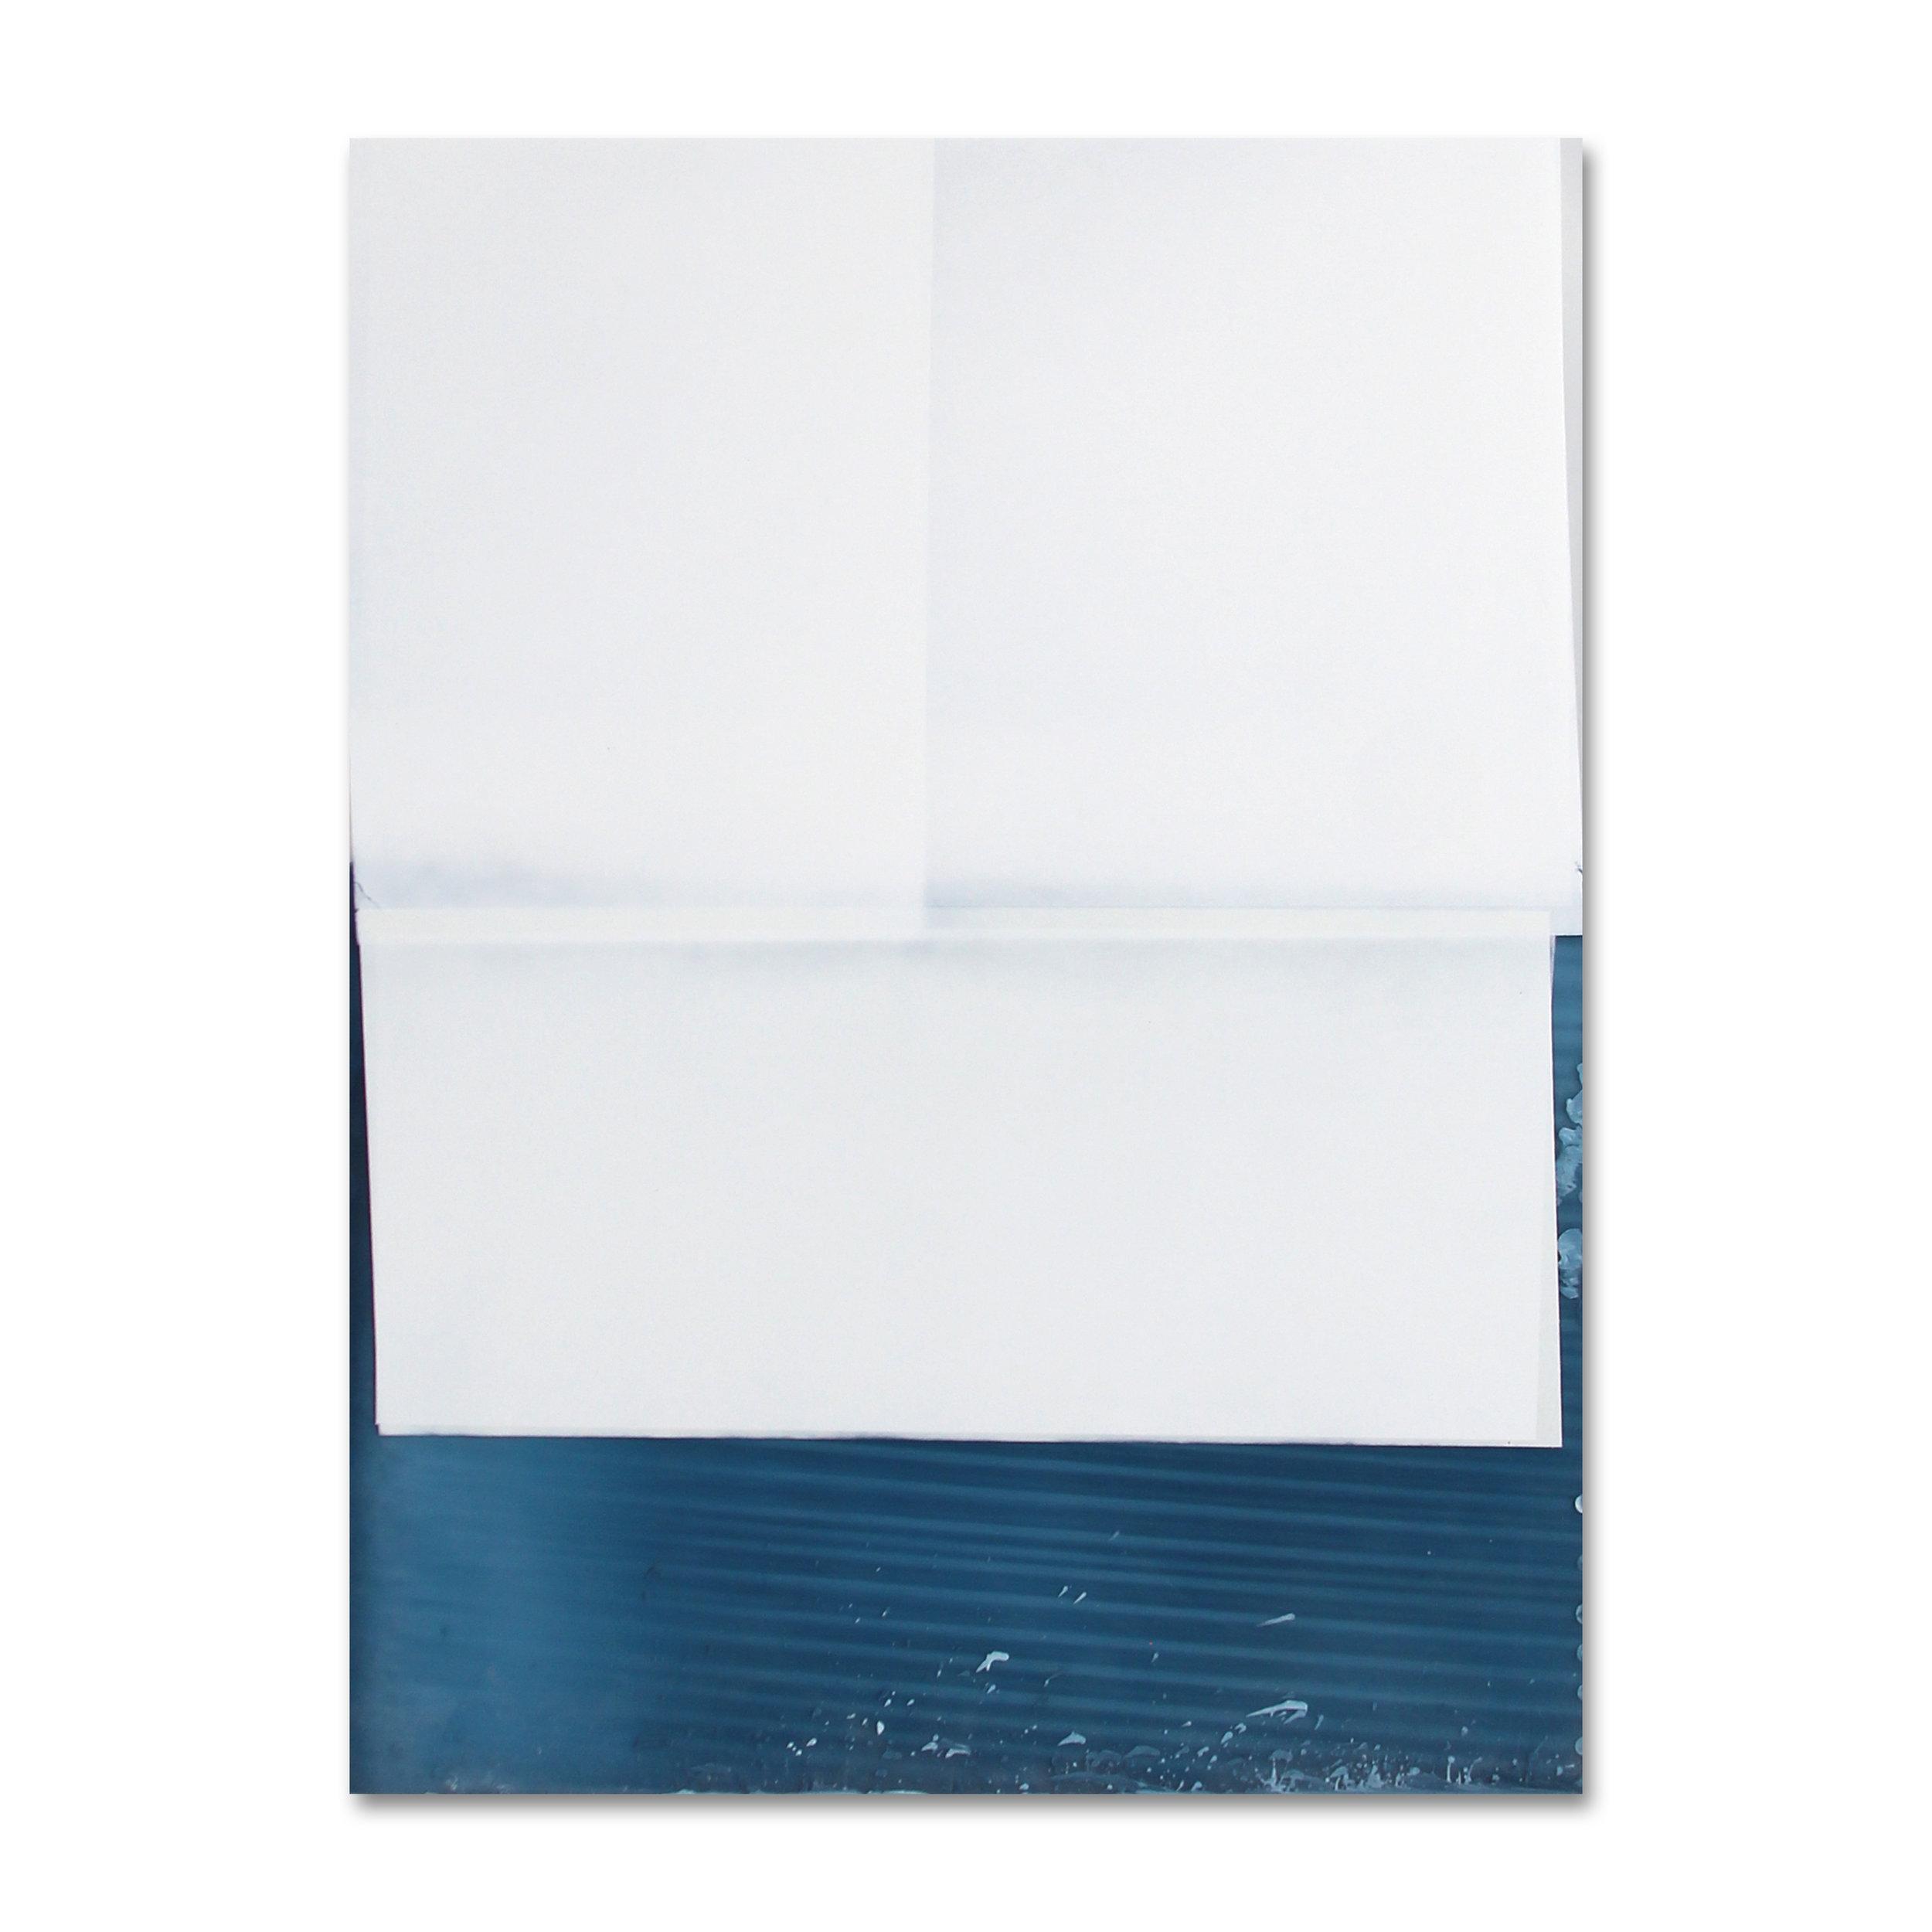 Postcard (Faraway, So Close)  Enamel on acrylic panel 24 x 18 inches 60.96 x 45.72 cm 2018